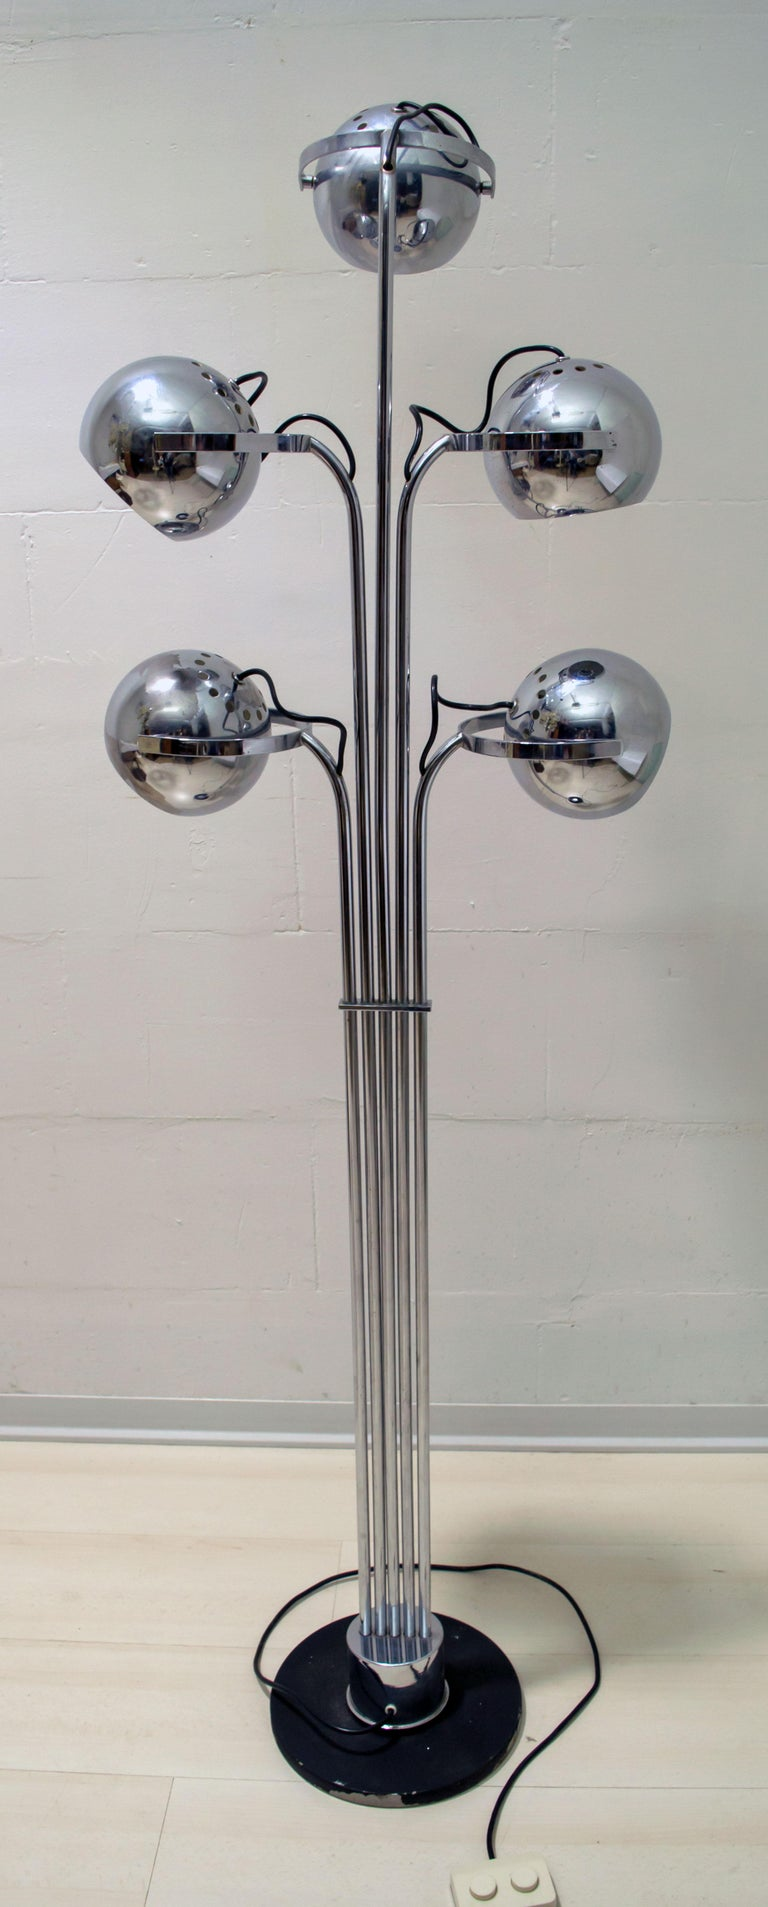 Goffredo Reggiani Mid-Century Modern Italian 5 Lights Chrome Floor Lamp, 1970s For Sale 3